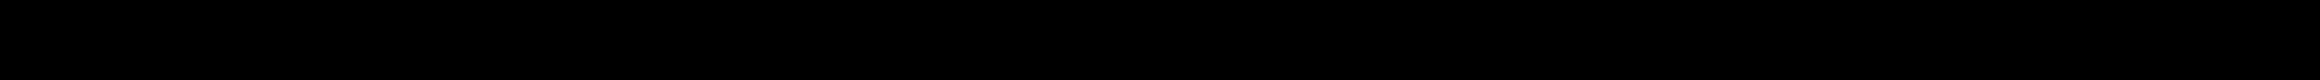 FERODO 1K0615301AC, 1K0615301AK, 1K0615301AS, 1K0 615 301 S, 5C0615301 Disco de freno